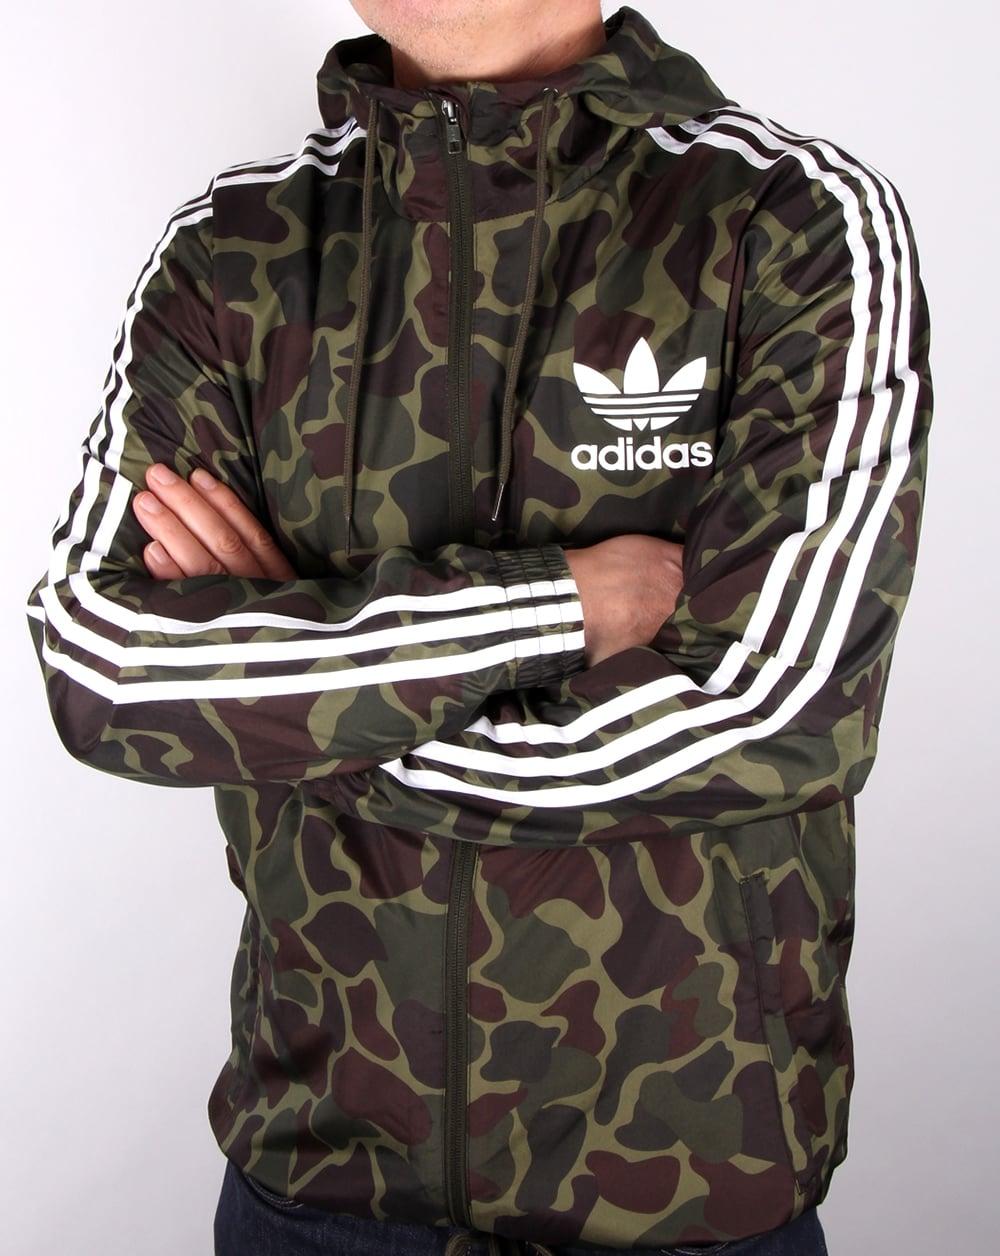 adidas jacket camouflage. Black Bedroom Furniture Sets. Home Design Ideas